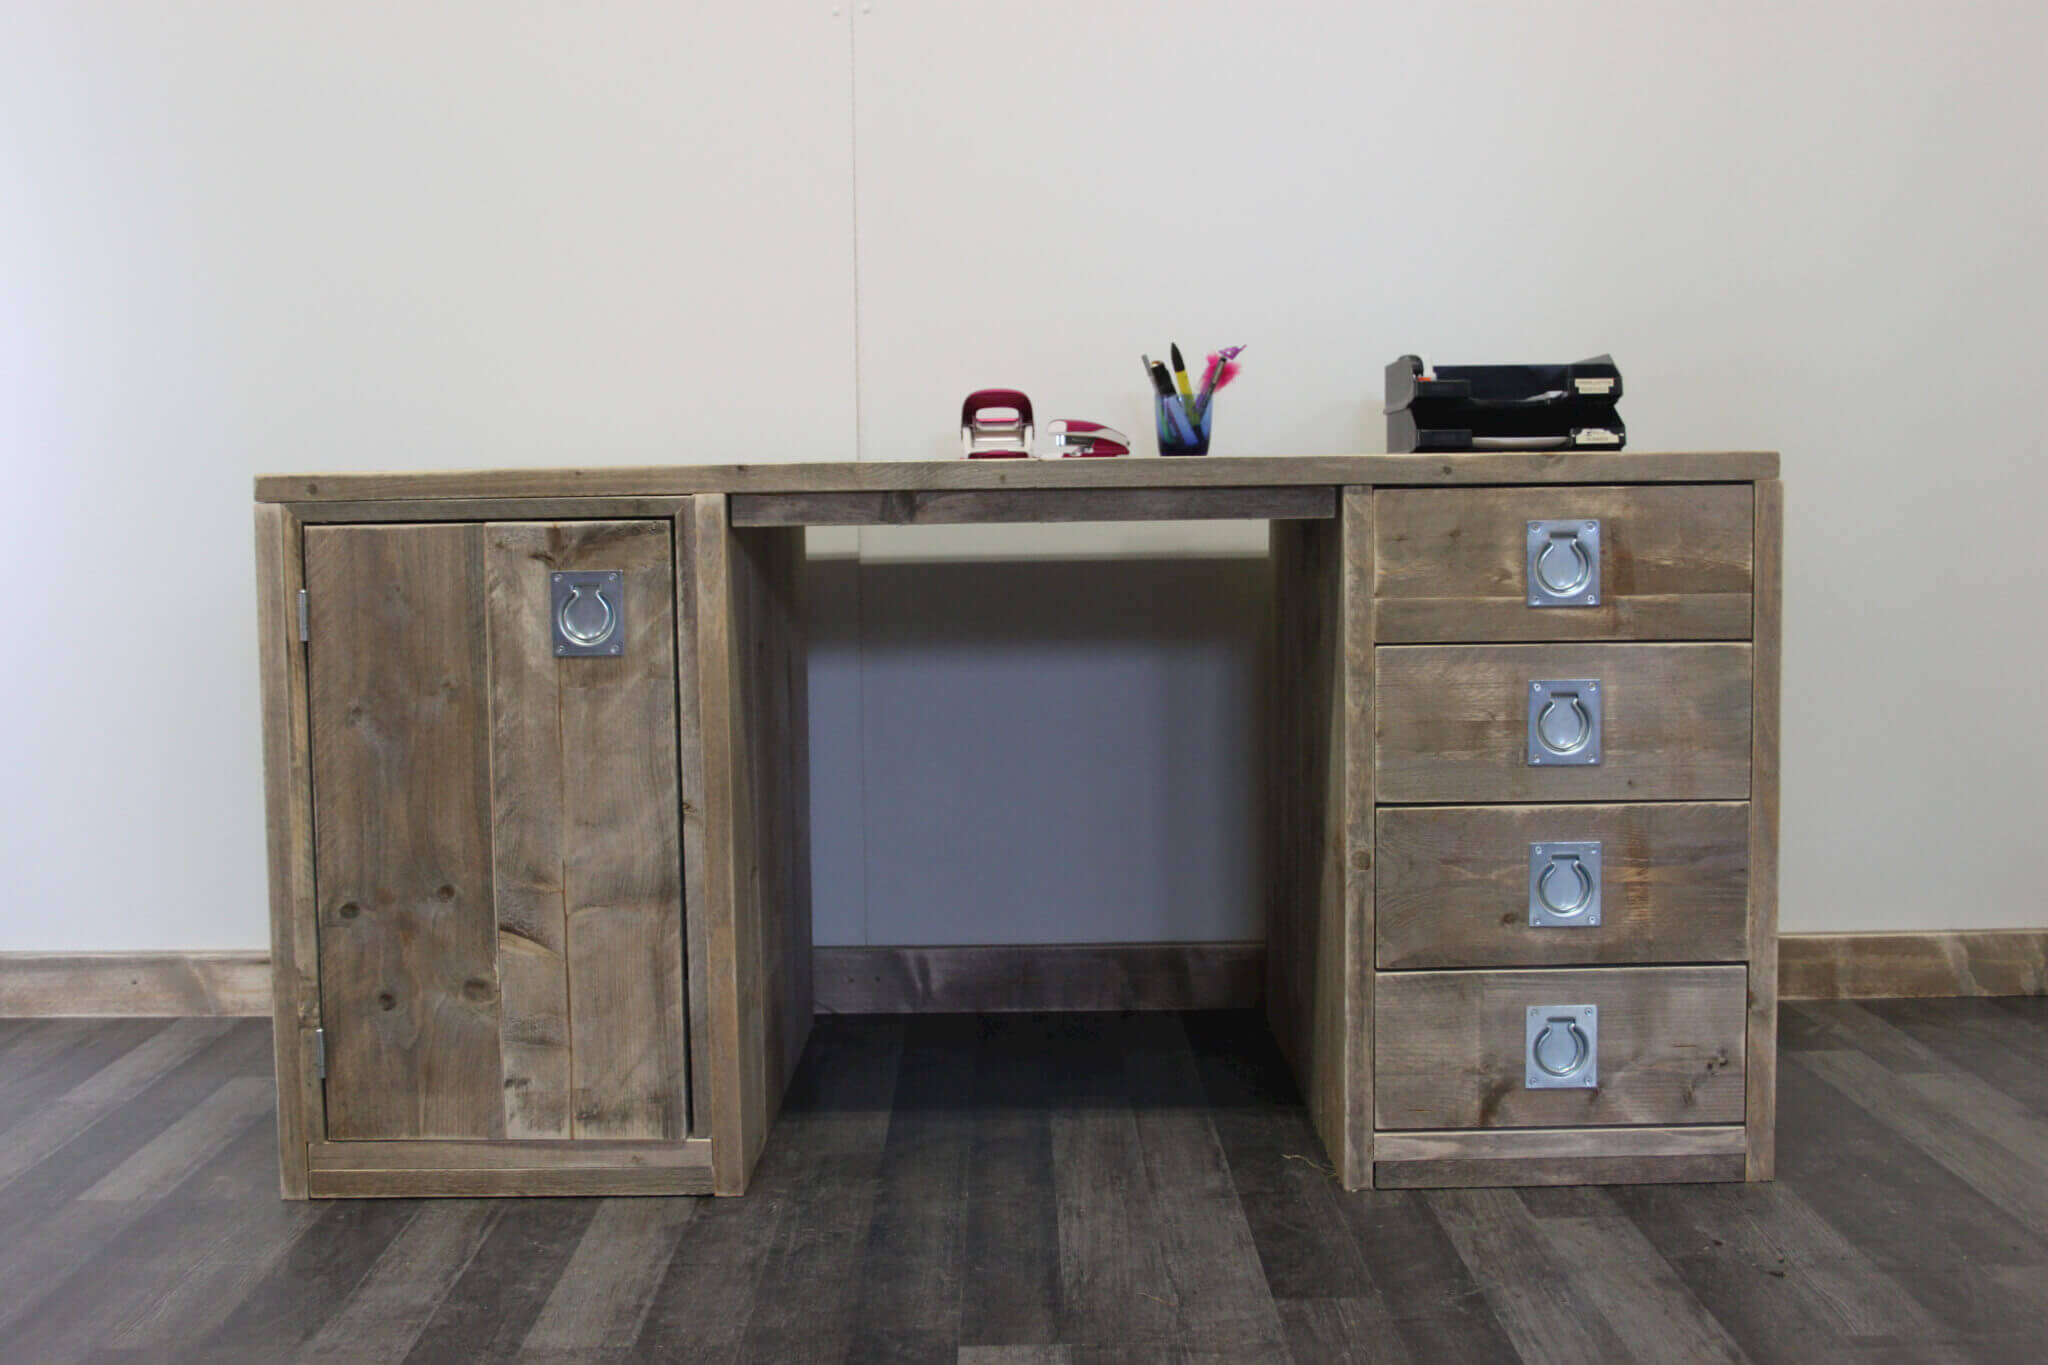 Kinderkamer Met Bureau : Bureau voor kinderkamer good bureau voor kinderkamer with bureau